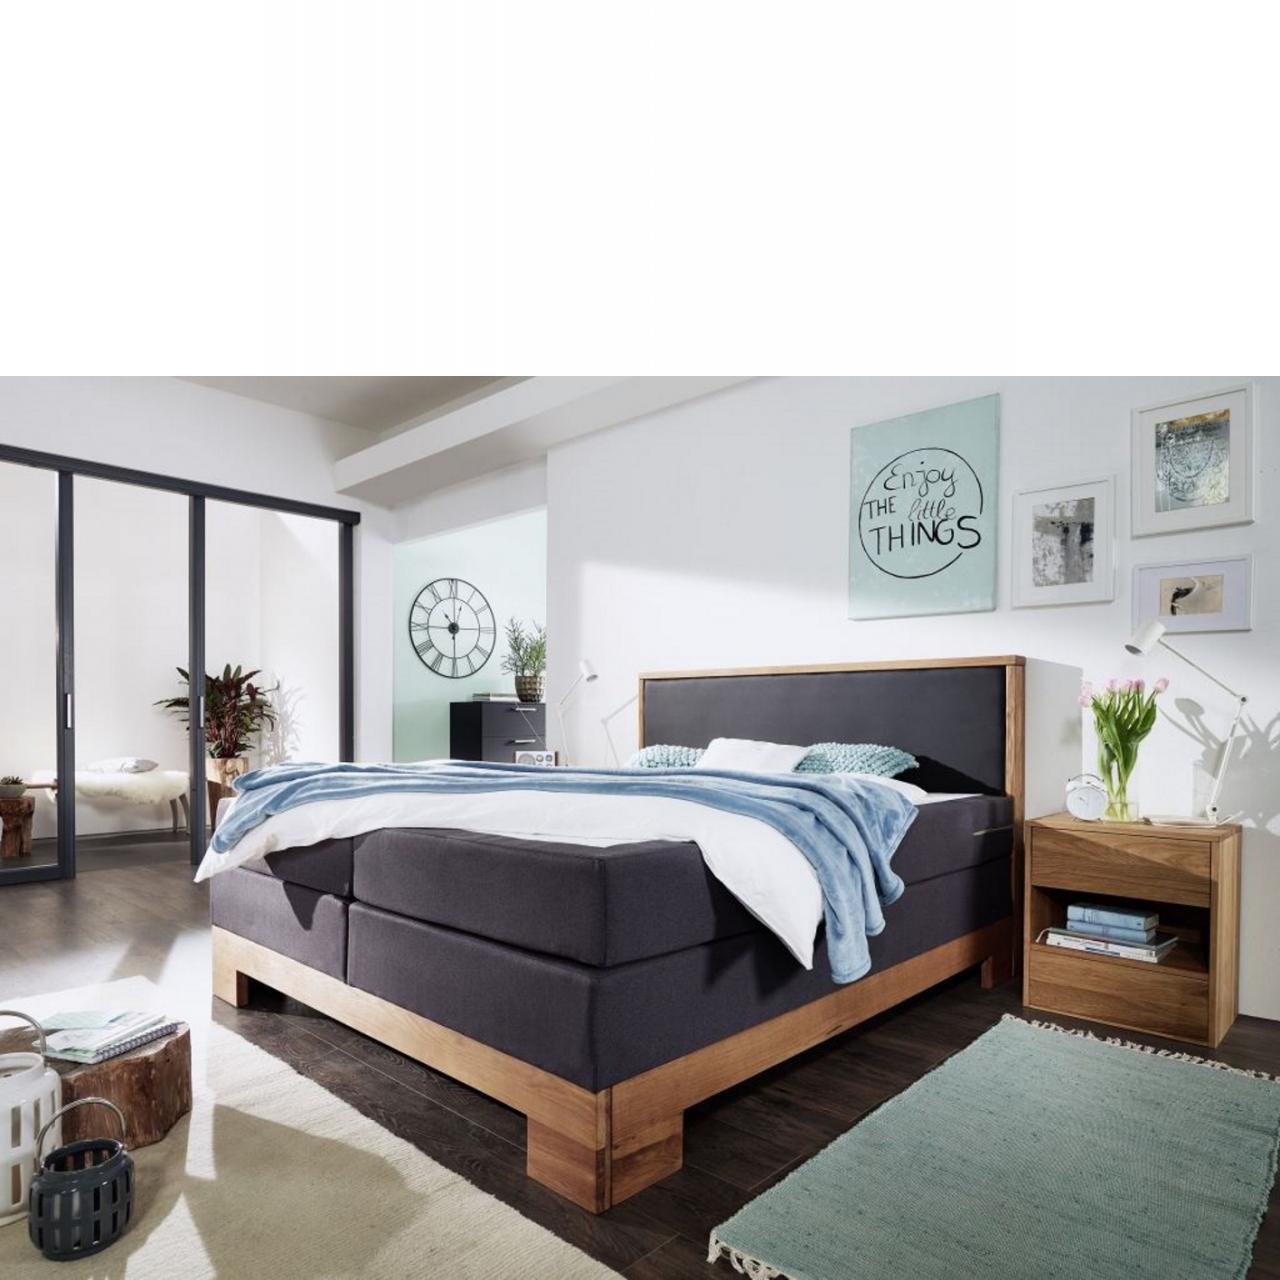 Bett dunkelgrau - 180x210 cm - Wildeiche massiv